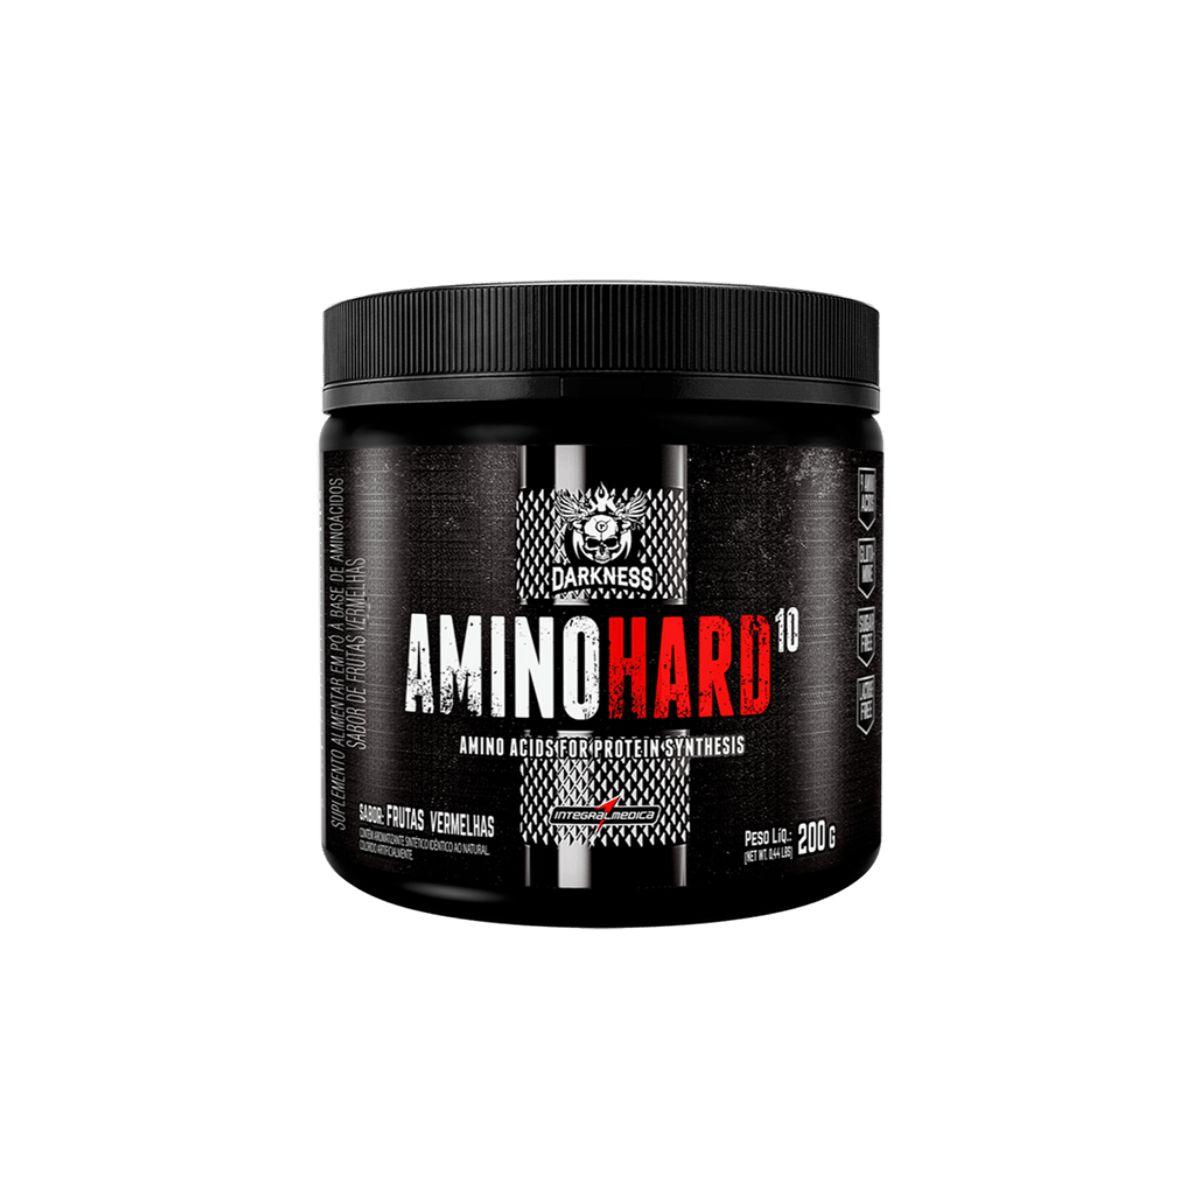 Amino Hard 10 Darkness 200g - IntegralMédica